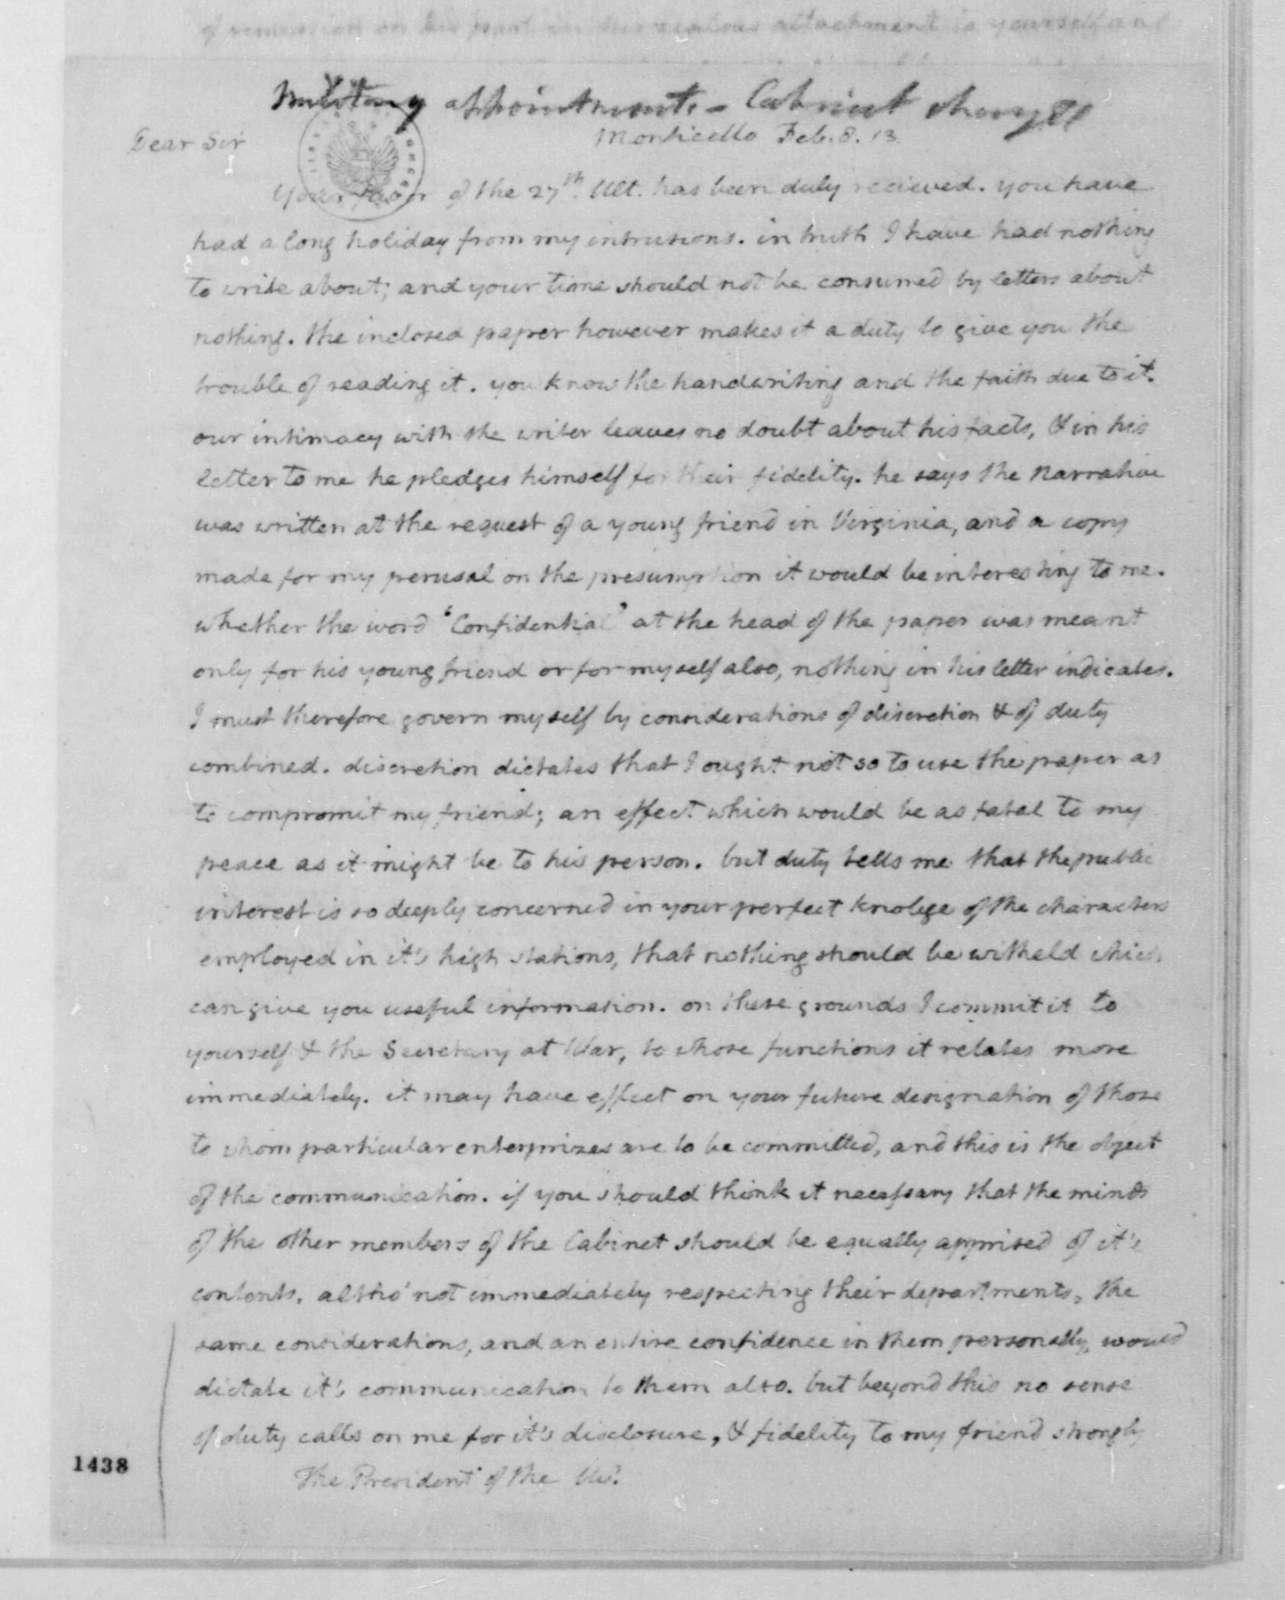 Thomas Jefferson to James Madison, February 8, 1813.